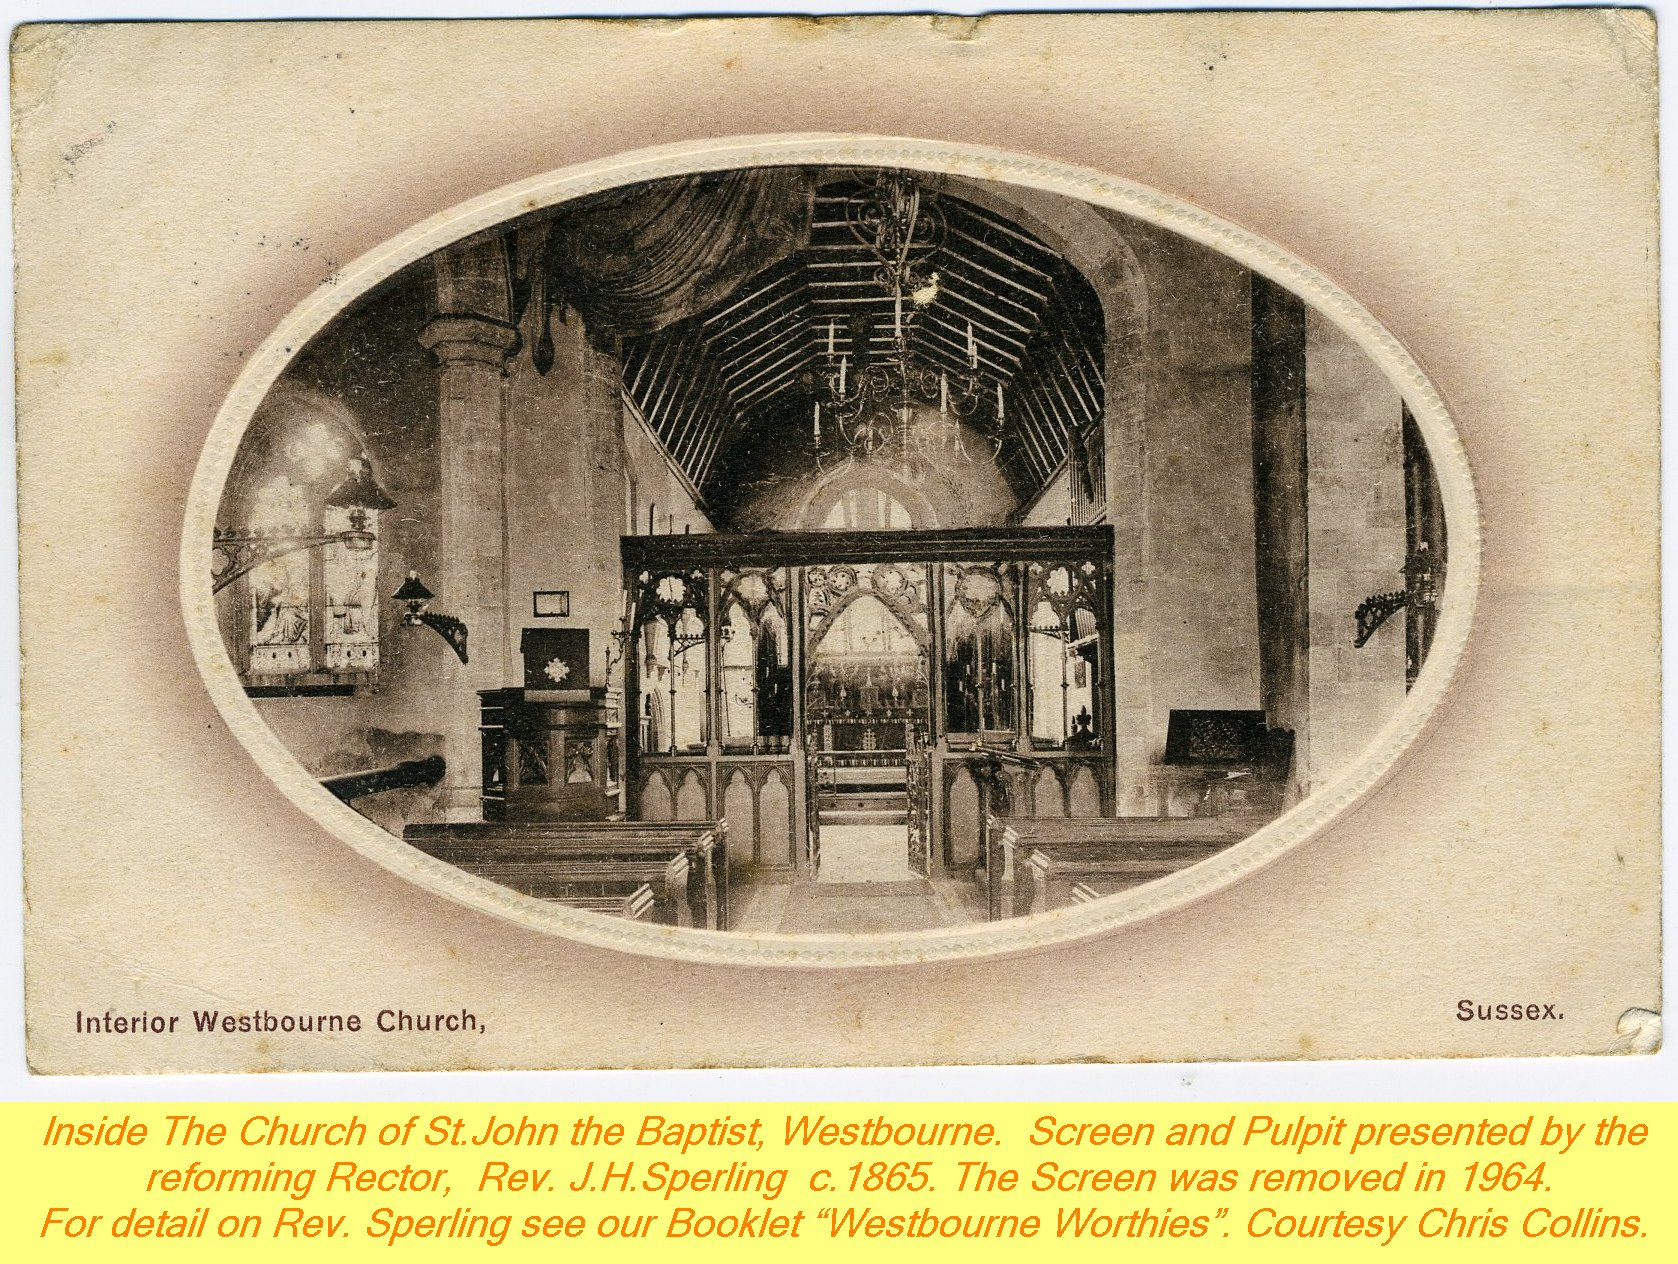 WESTBOURNE HISTORY PHOTO, CHURCH, St. JOHN, YEW, INTERIOR, SCREEN, SPERLING